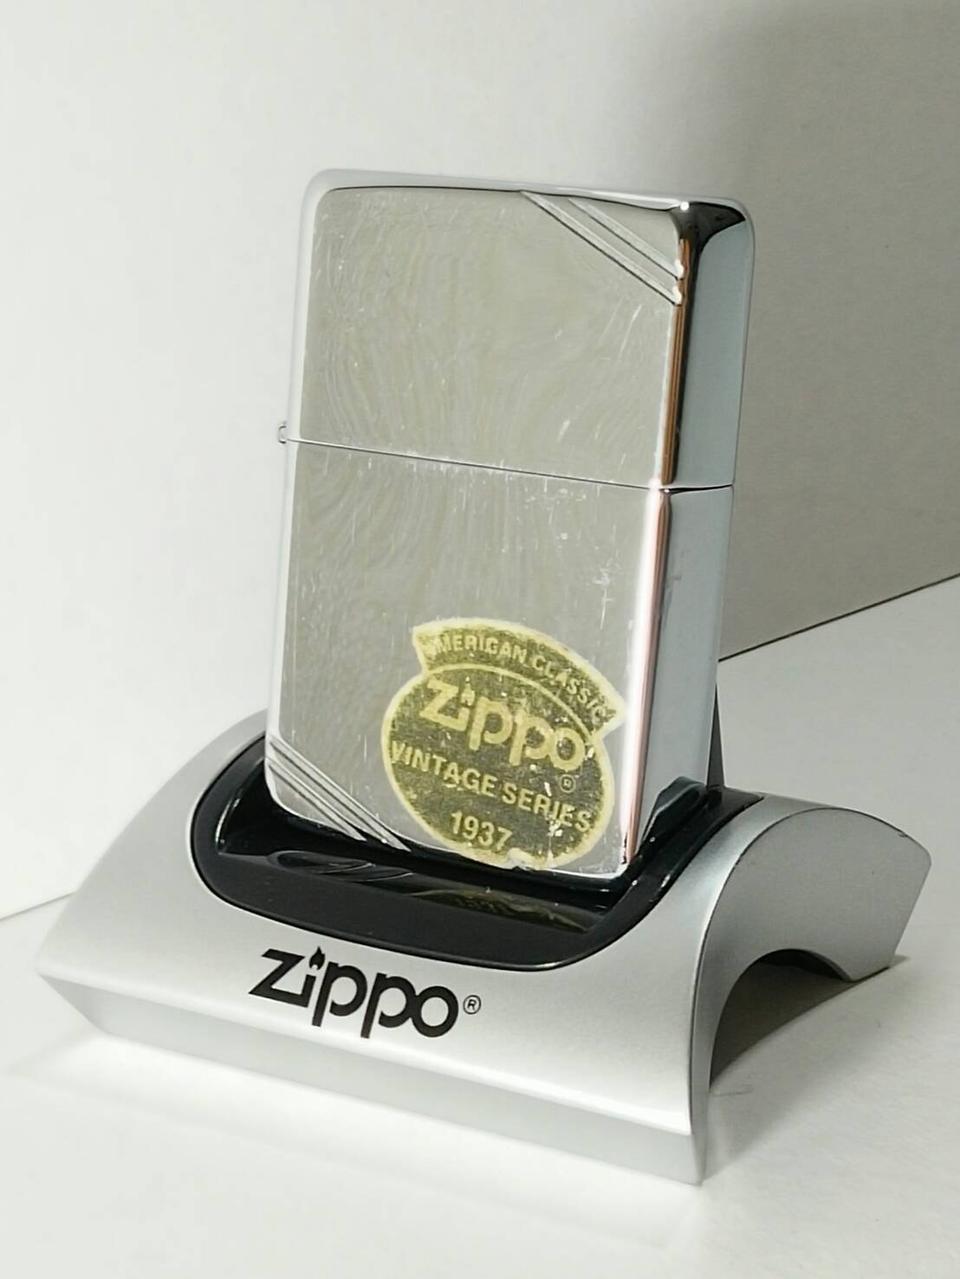 ZIPPO American Classic Lighter Vintage Series 1937 Slashes (High Polish Chrome) 260 รูปที่ 1